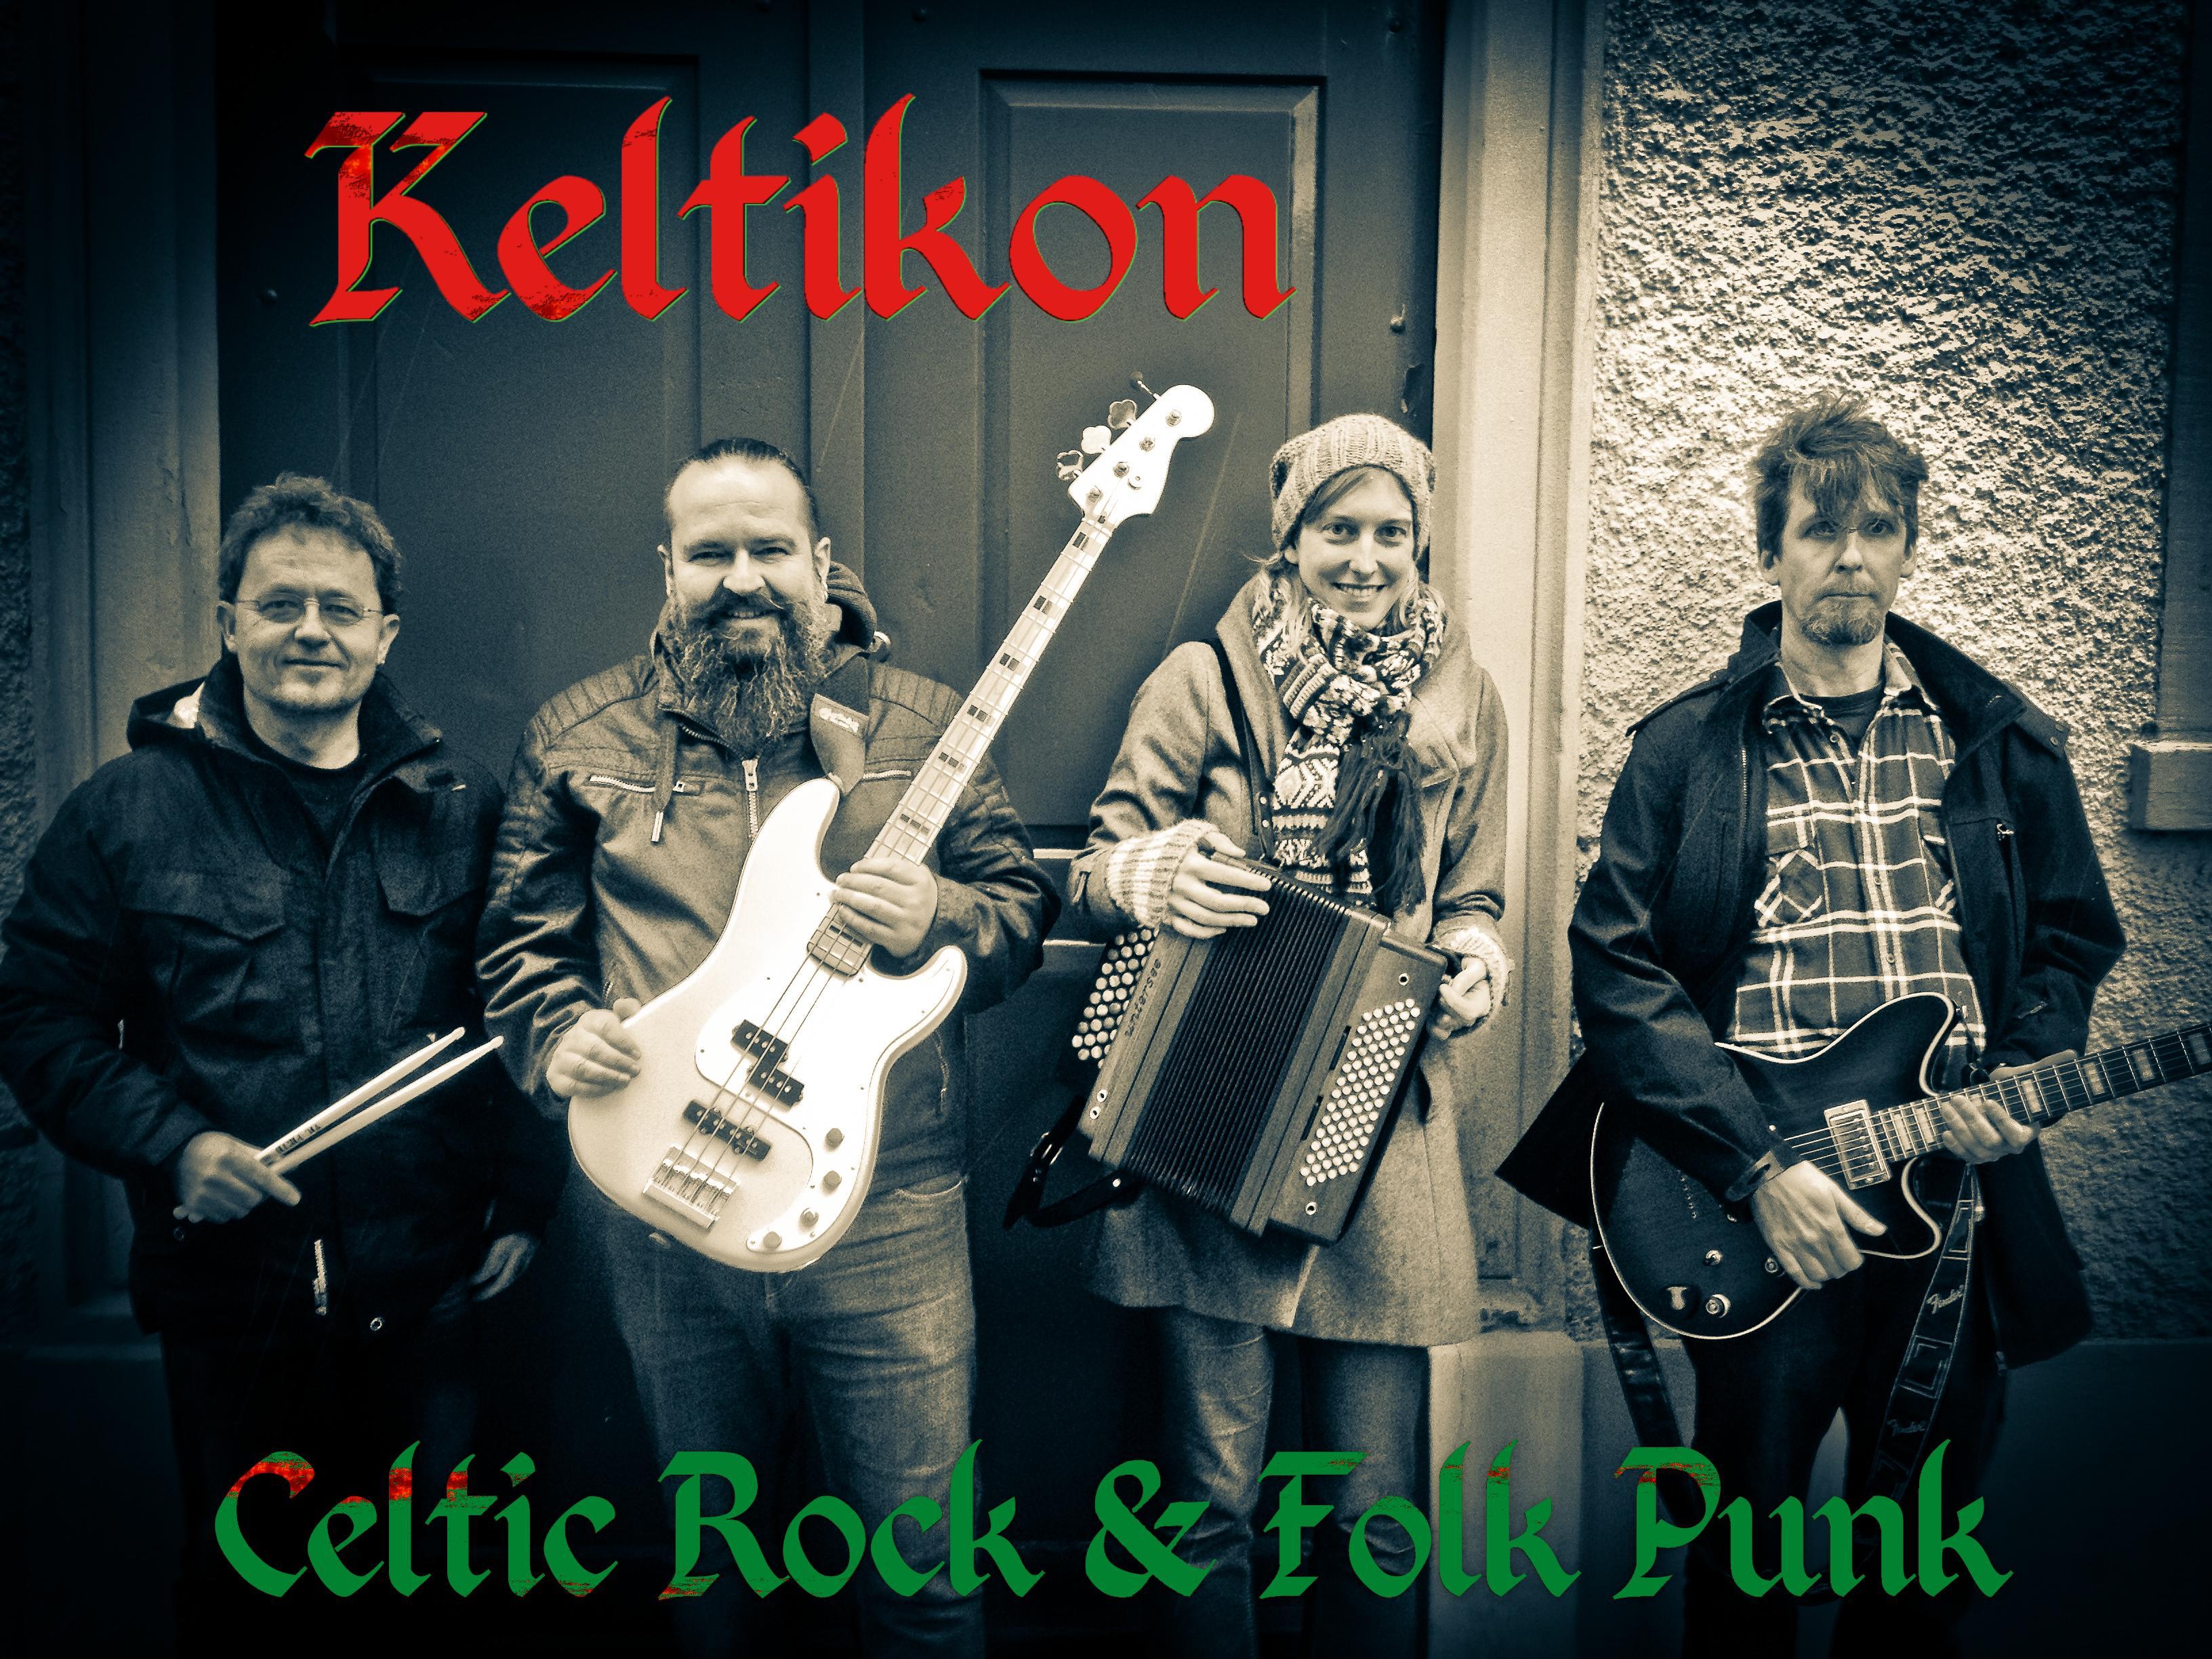 Keltikon Band 2016 sw incl. logo